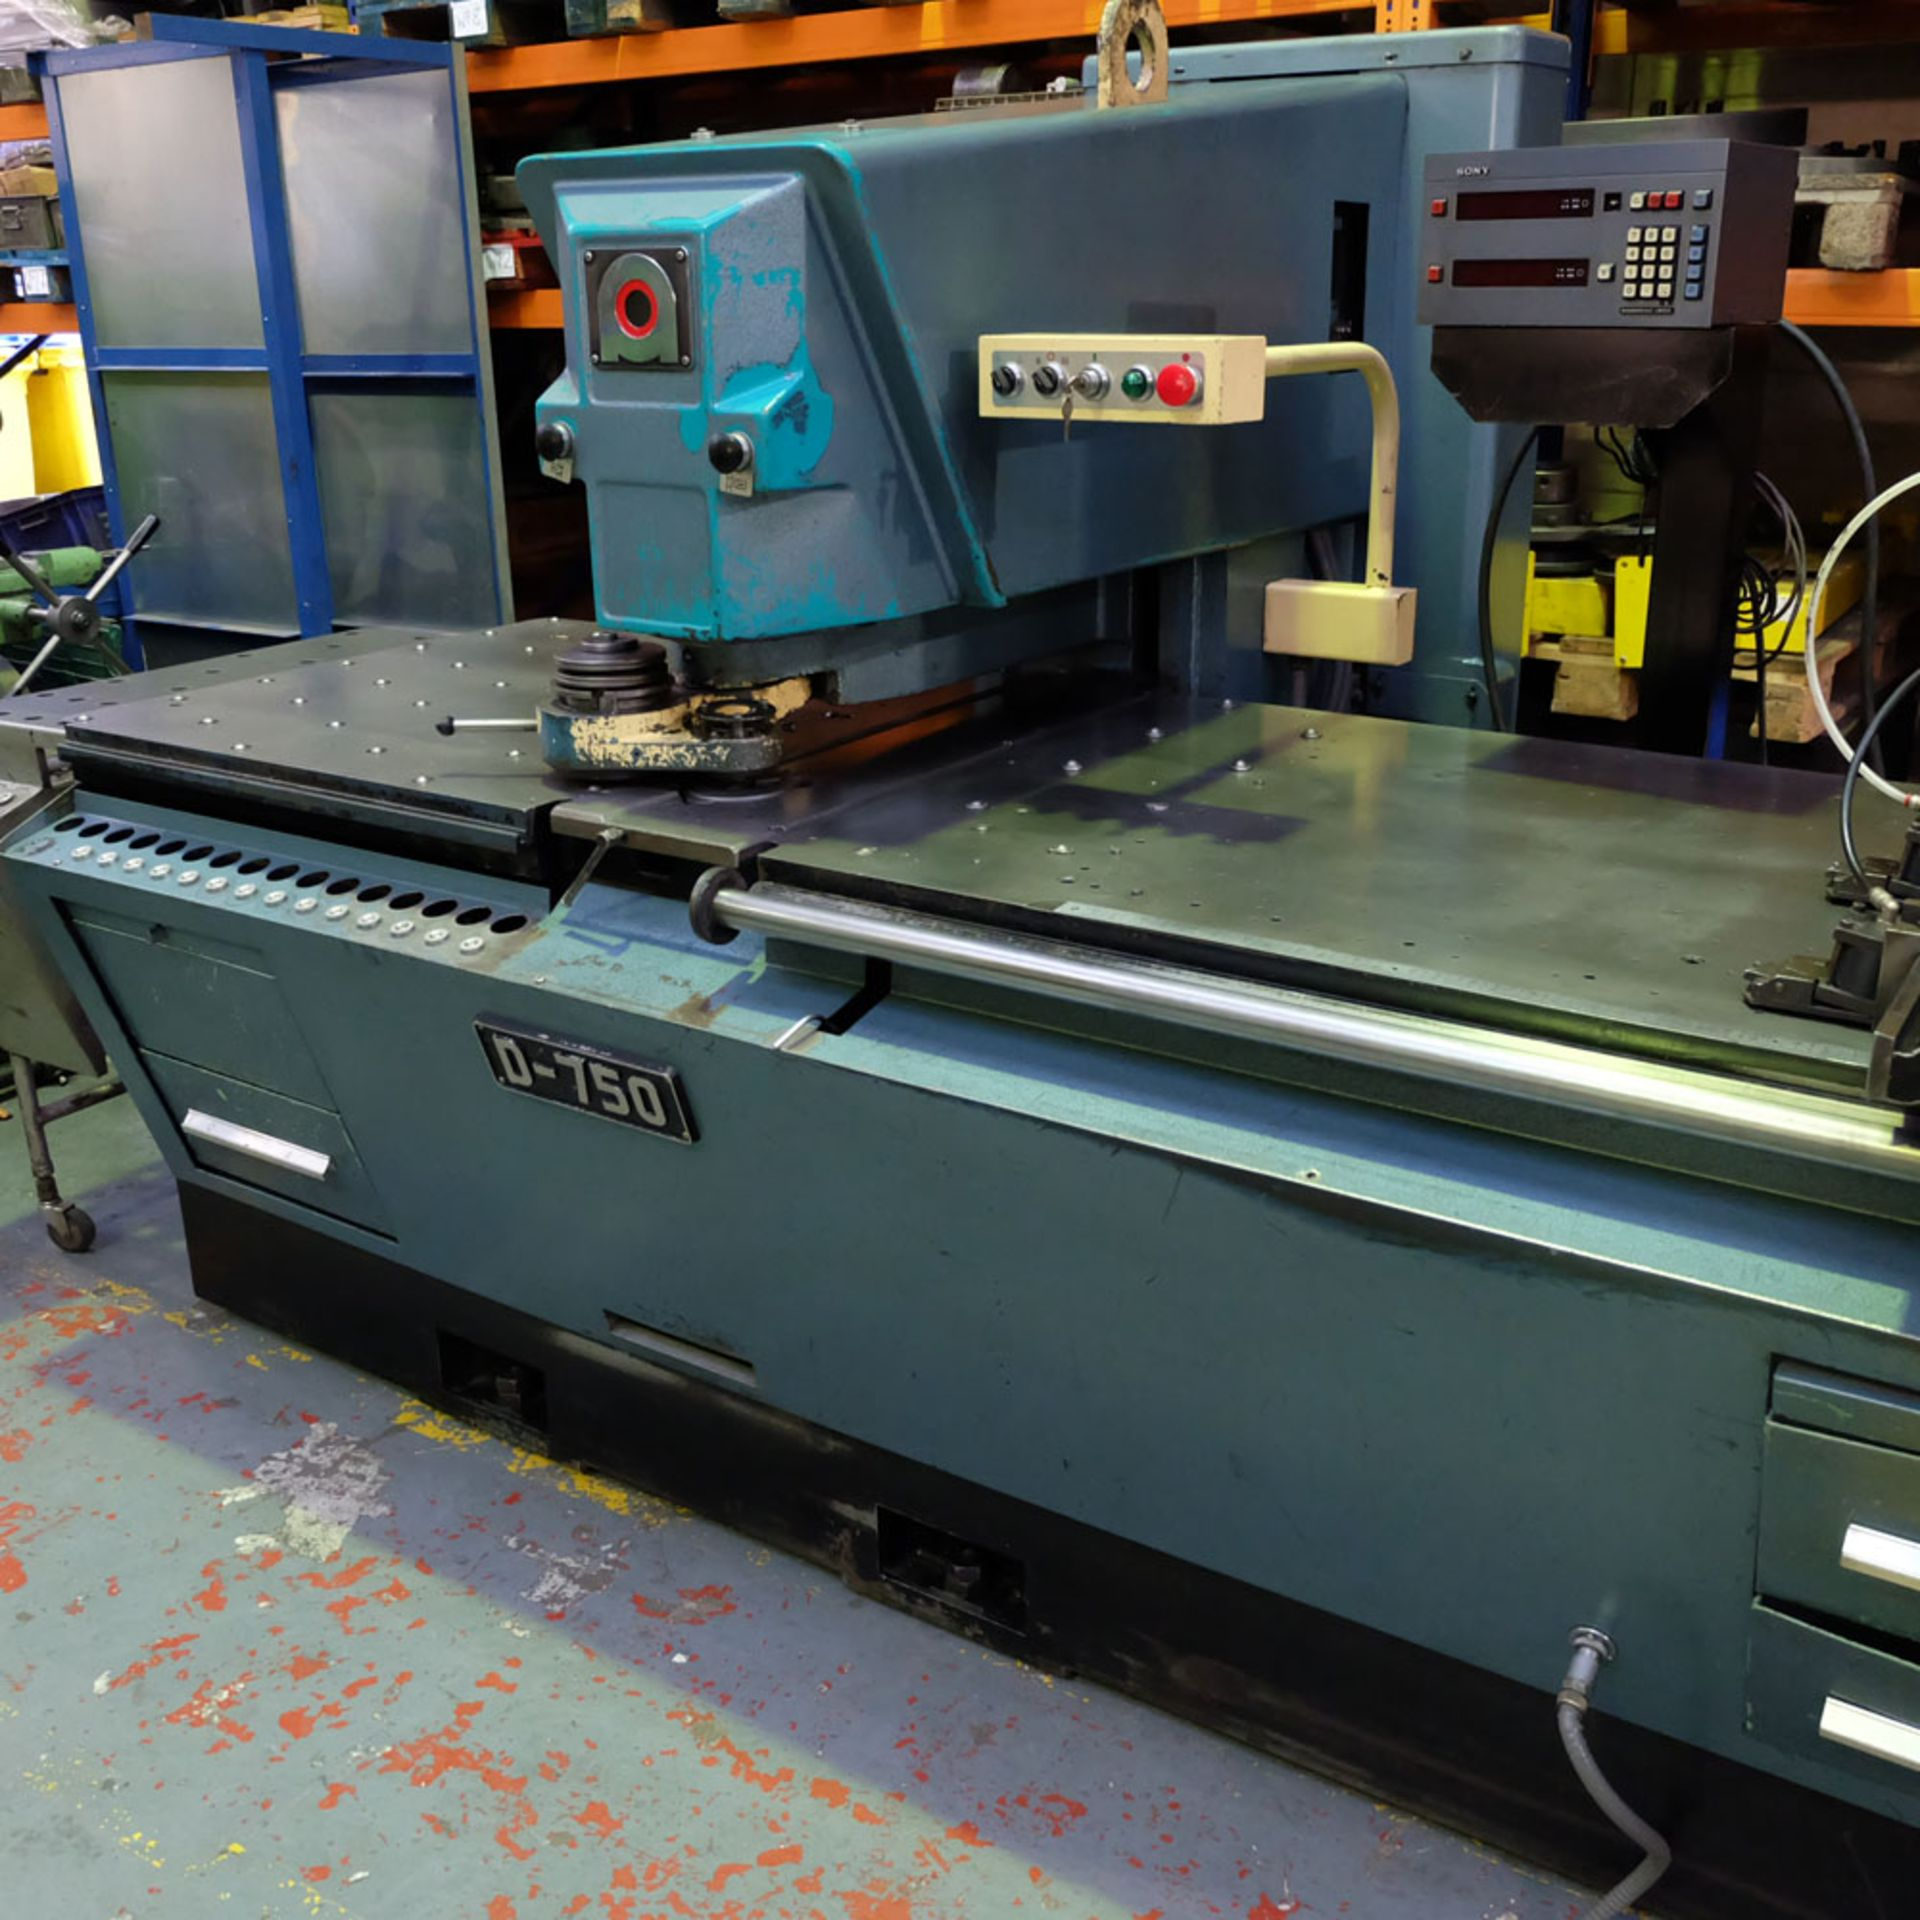 Amada D-750 Duplicator Punching Machine. - Image 3 of 18